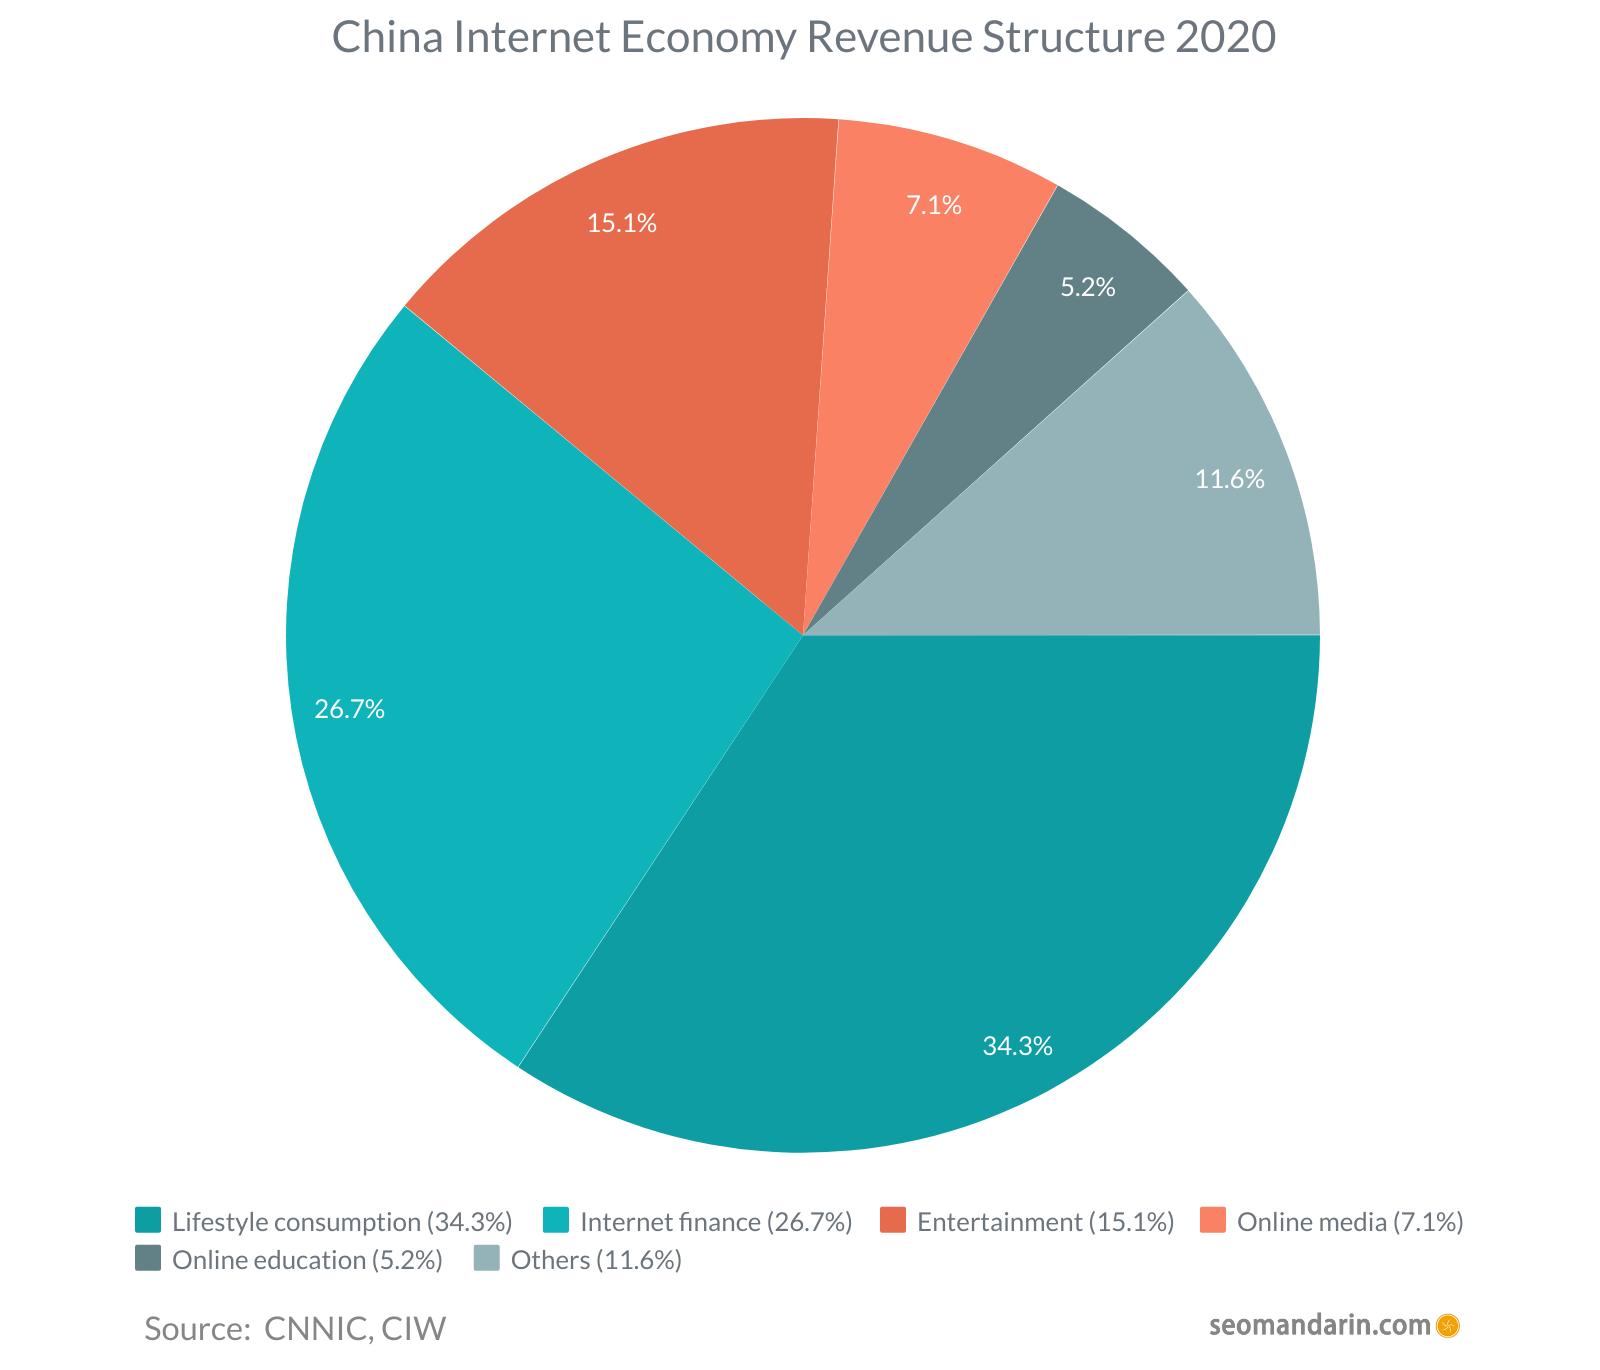 China Internet Economy Revenue Structure 2020